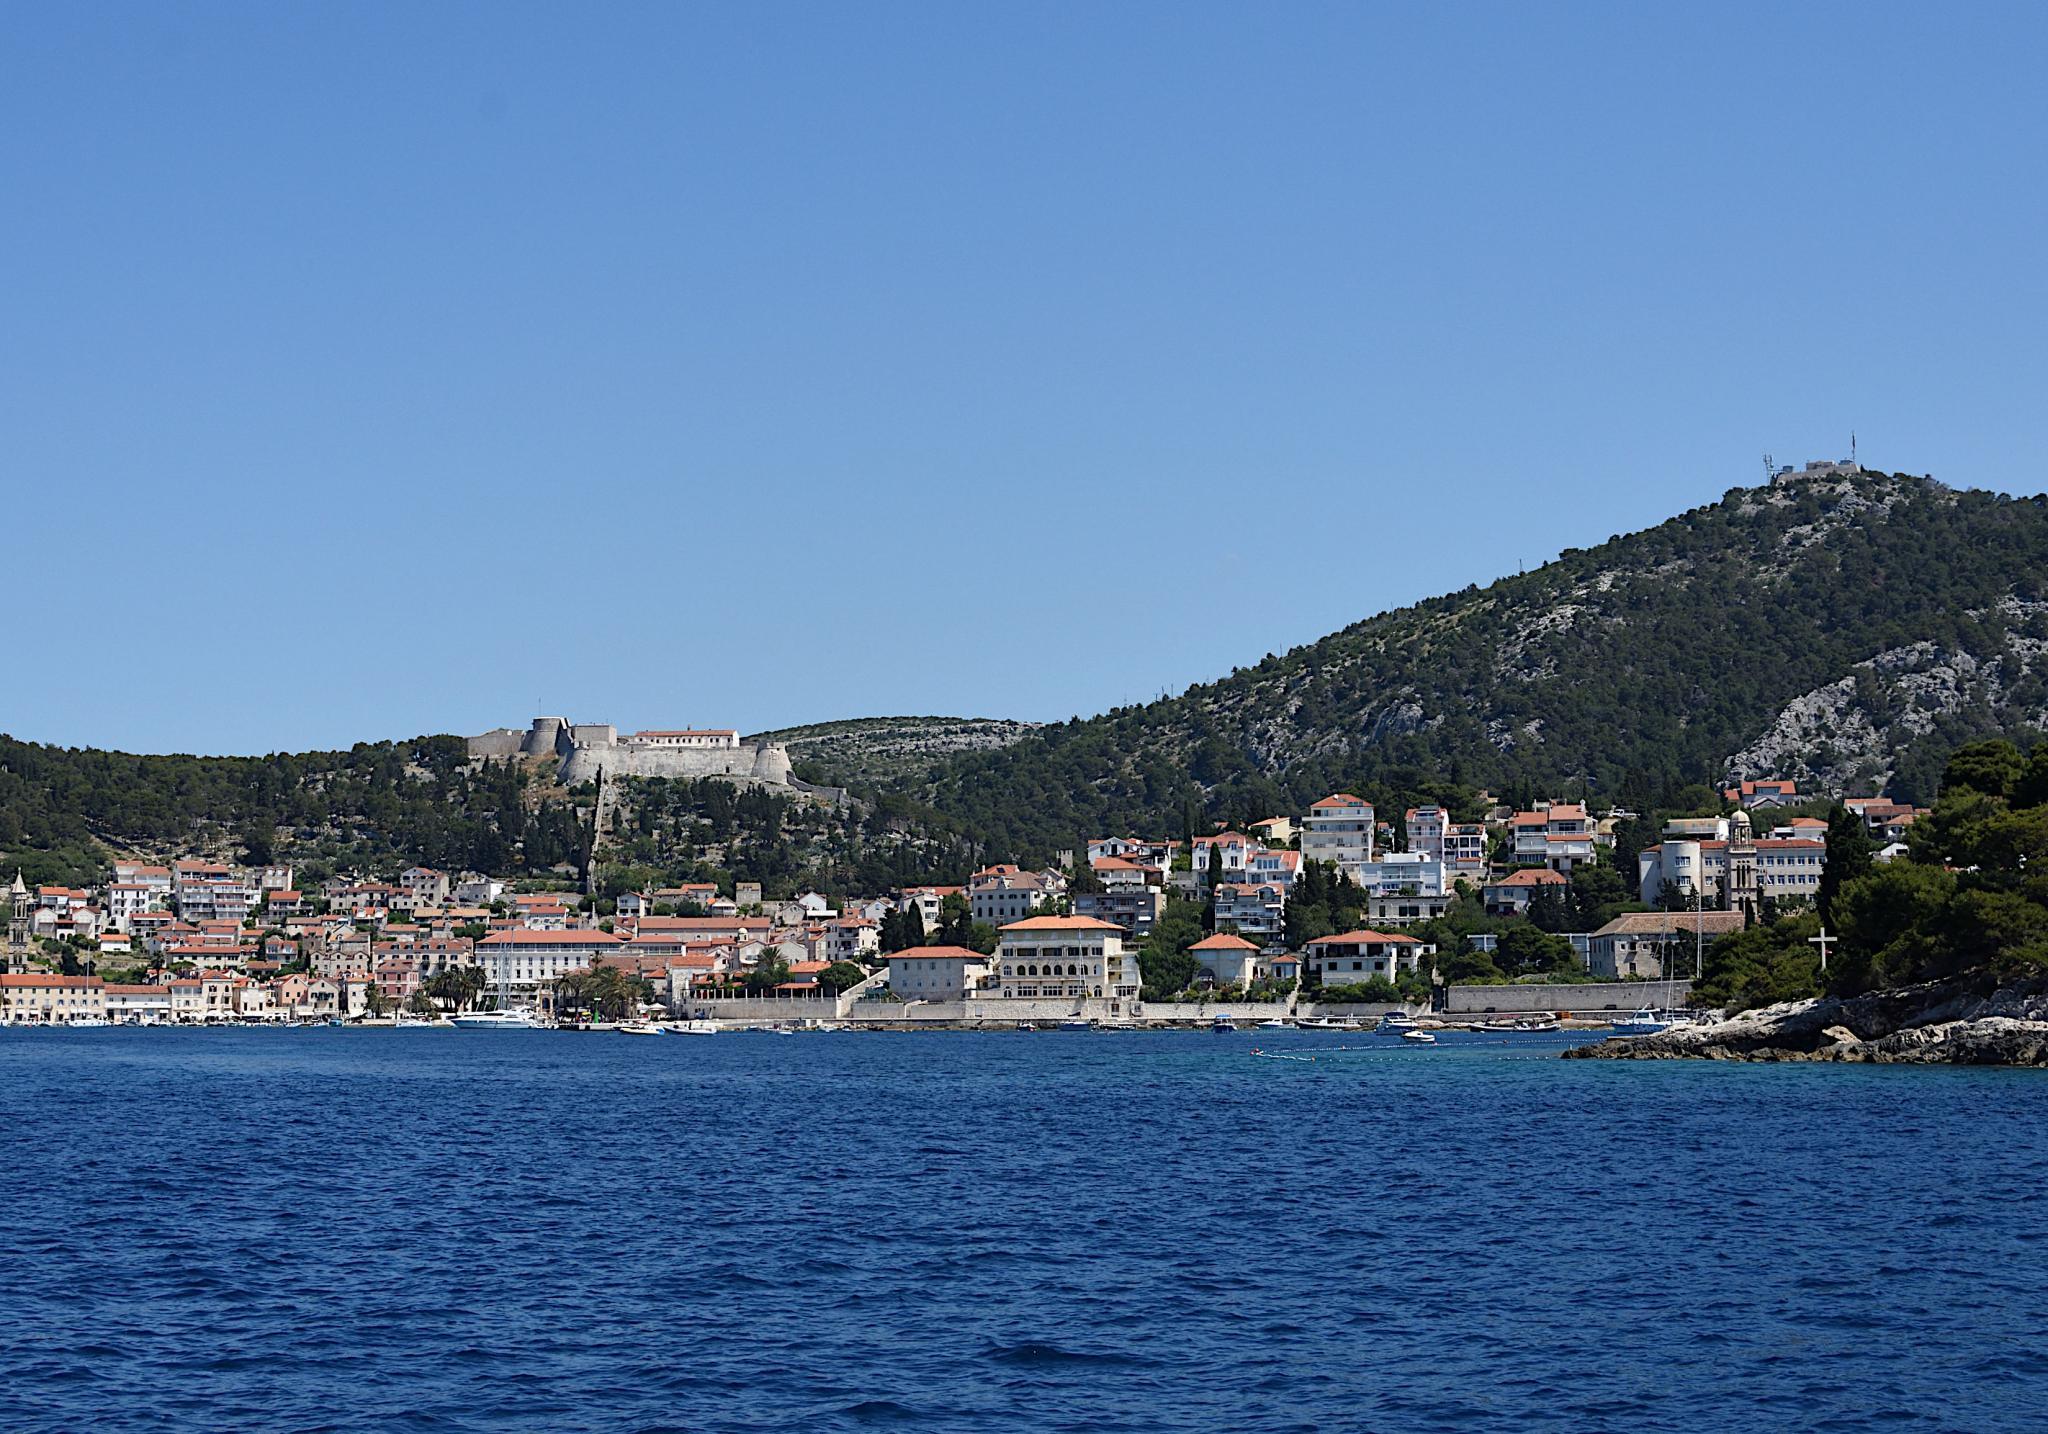 Week Sailing in Croatia-hvar_from_sea_2567_02-jpg